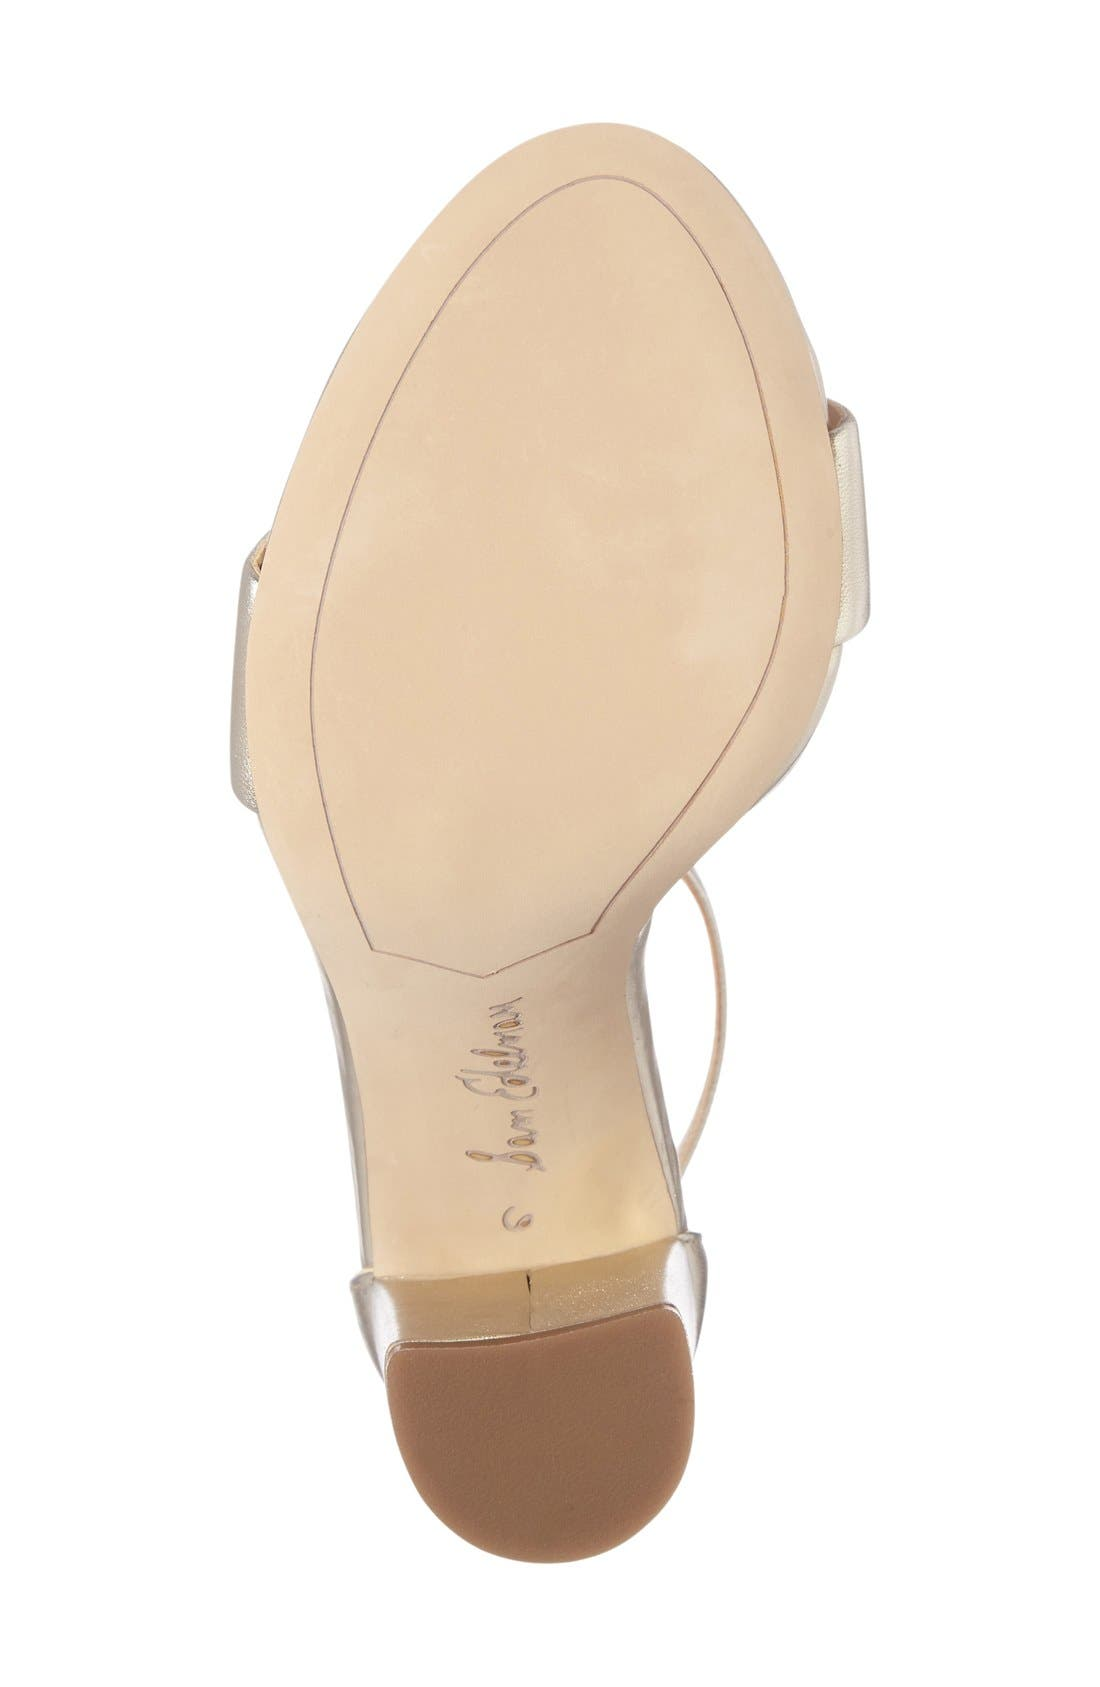 Yaro Ankle Strap Sandal,                             Alternate thumbnail 4, color,                             Jute Leather